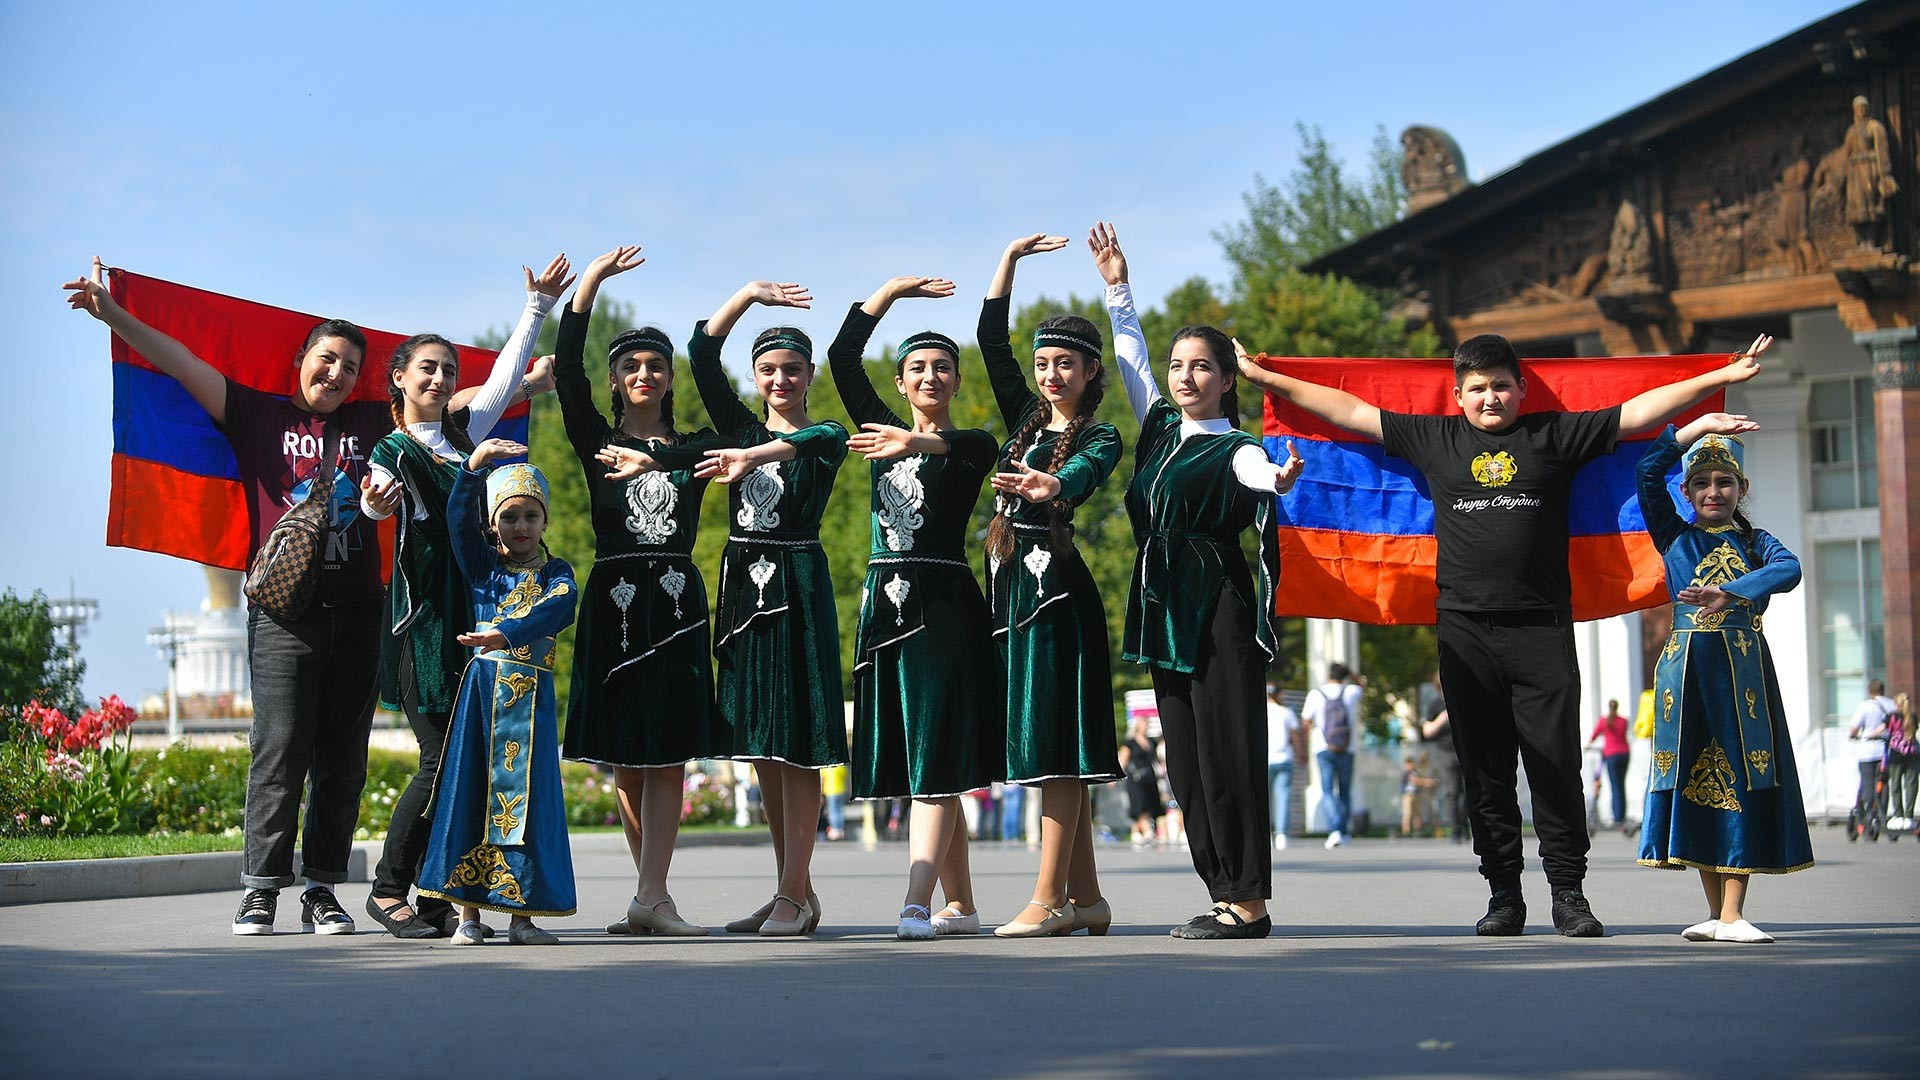 Festival ramah-tamah nasional rakyat Rusia dan negara-negara Persemakmuran Negara-Negara Merdeka (CIS) di Moskow.